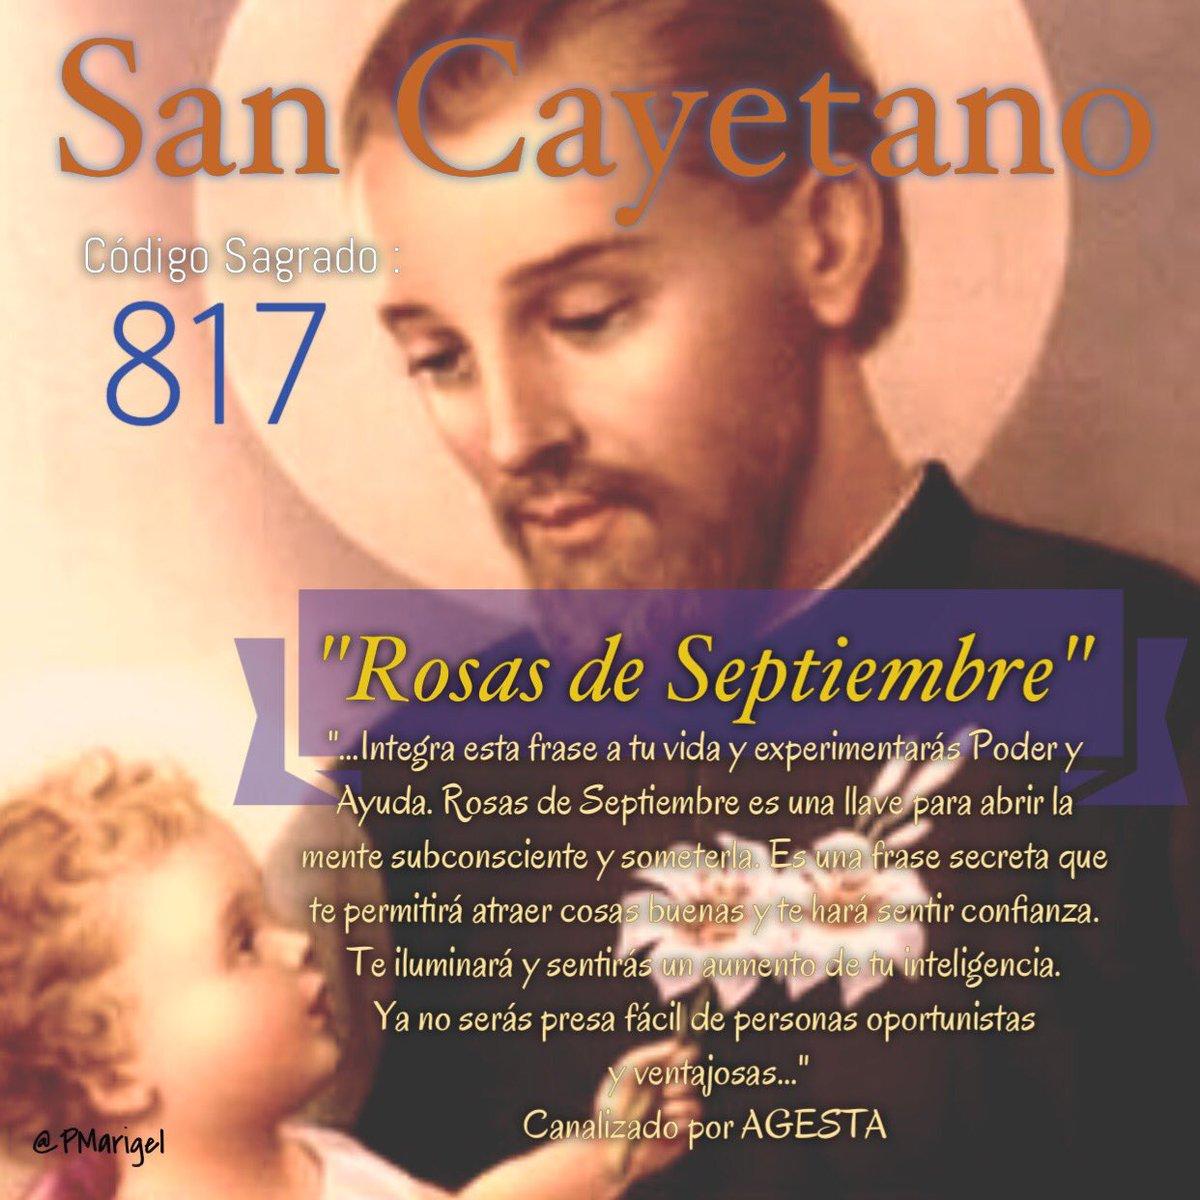 Códigos Sagrados On Twitter Mensaje De San Cayetano A